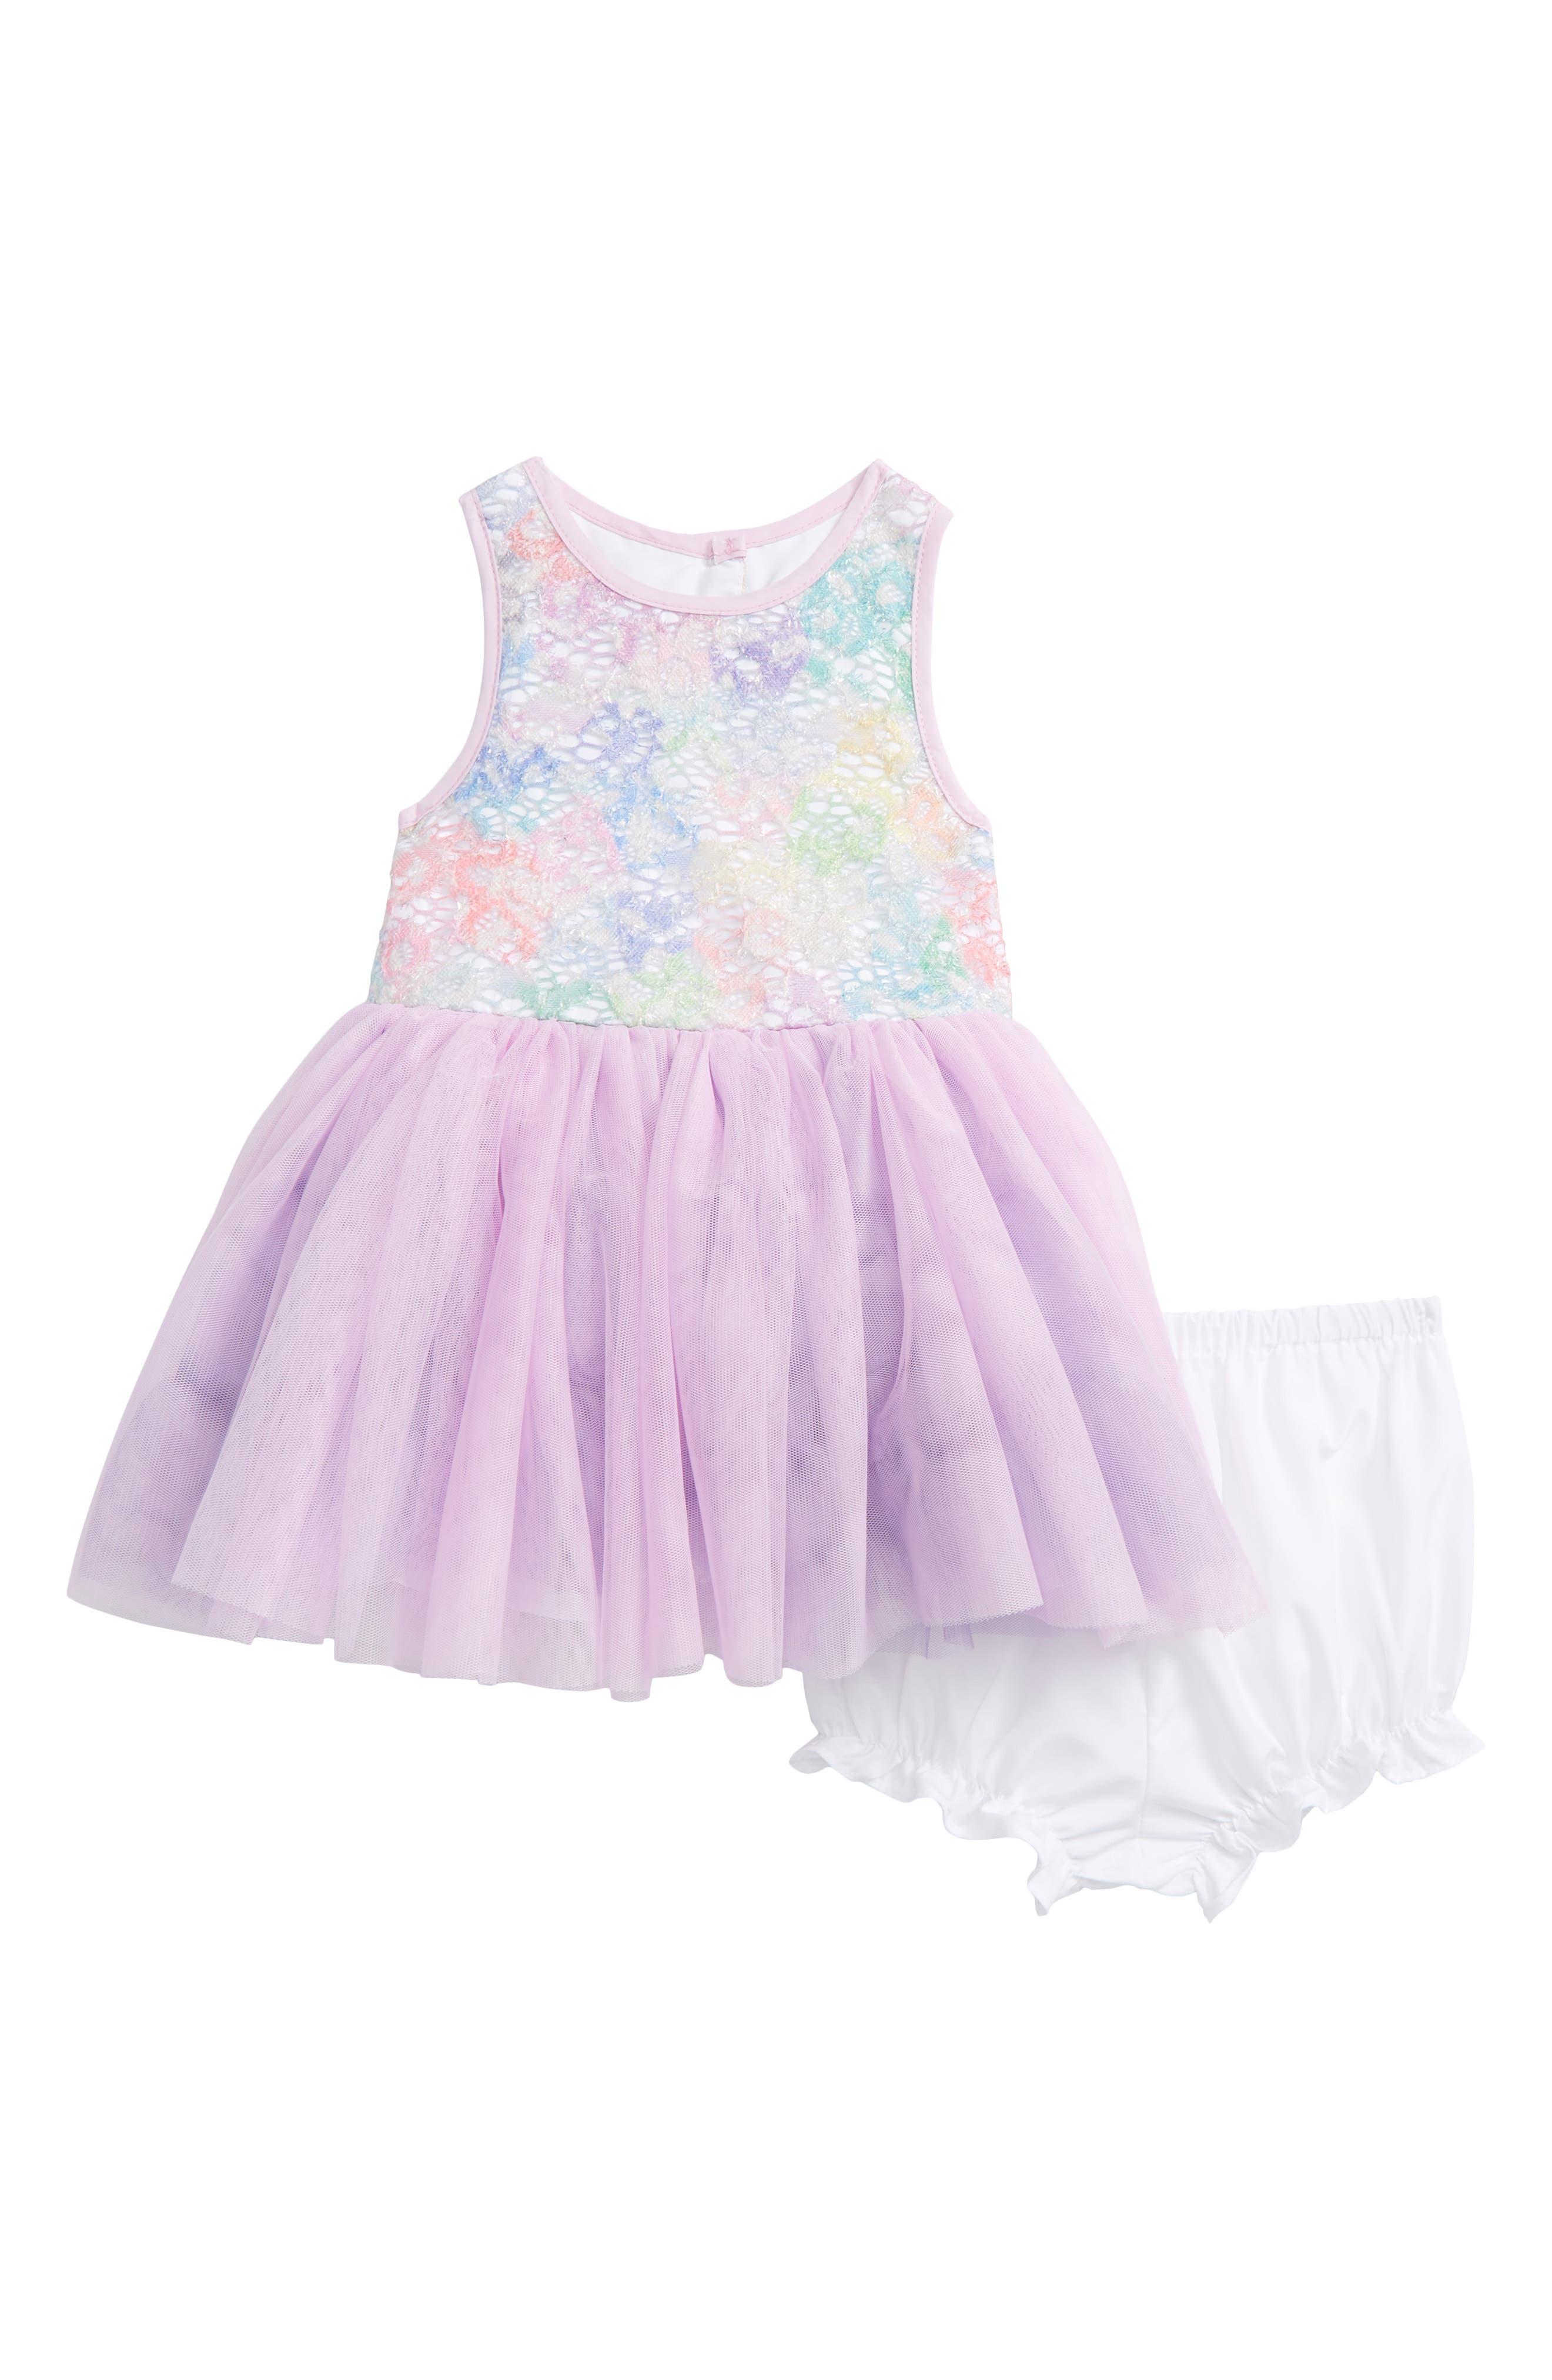 Main Image - Pippa & Julie Rainbow Tutu Dress (Baby Girls)